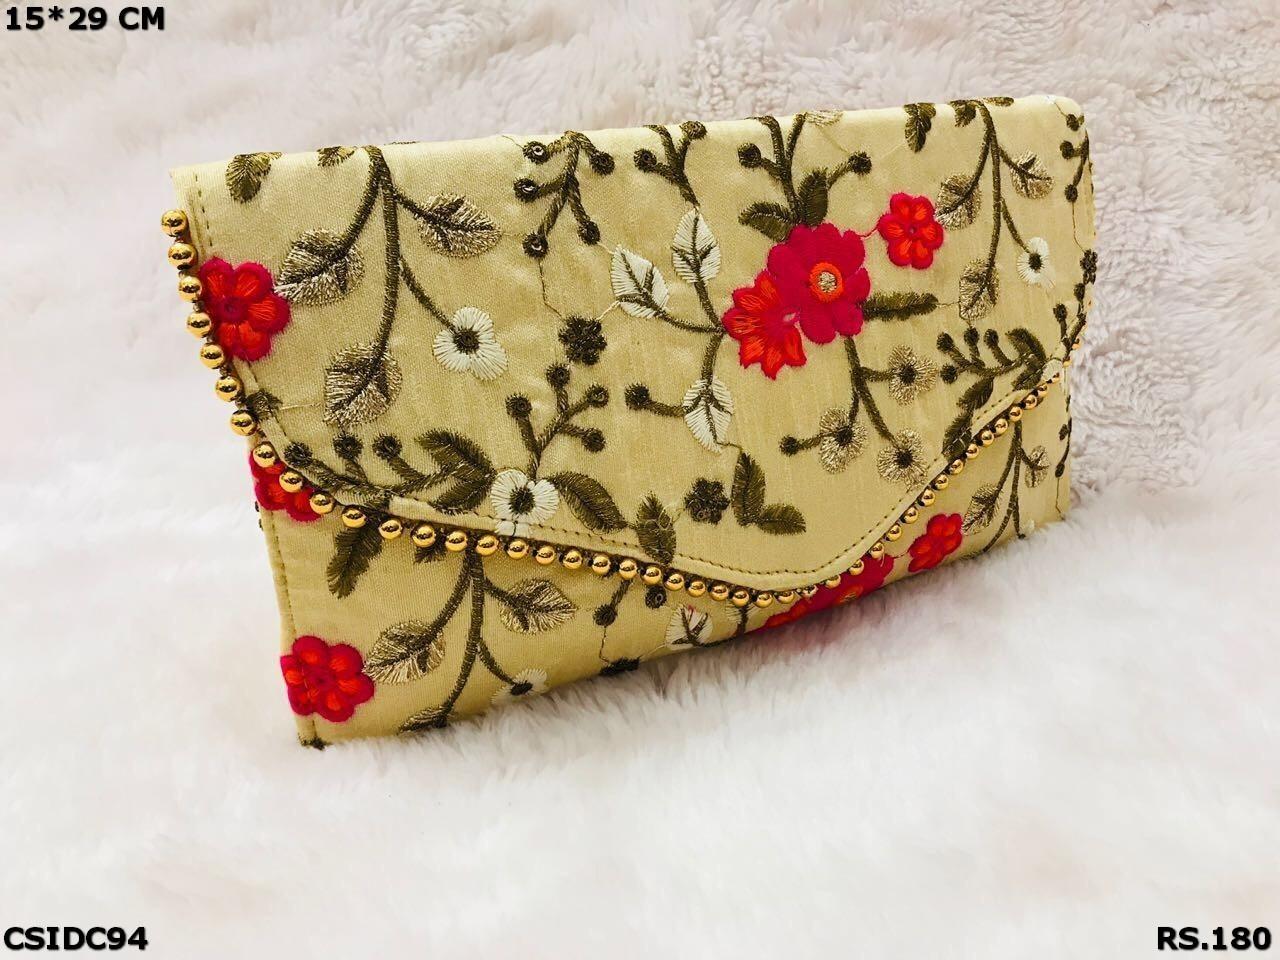 Embroide Clutch